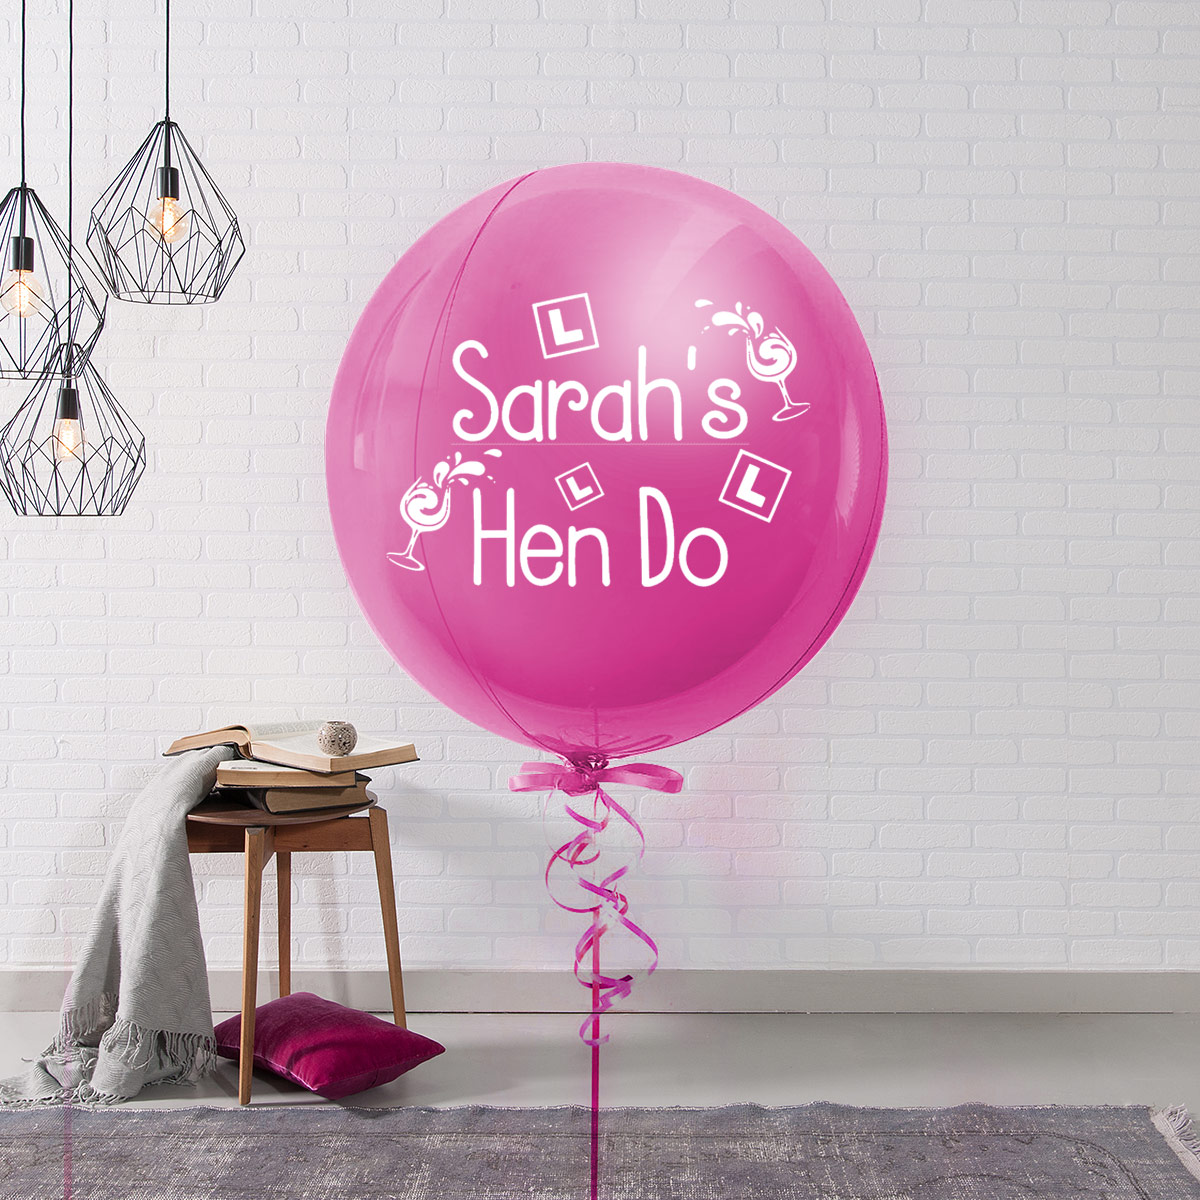 title='个性珠光气球'